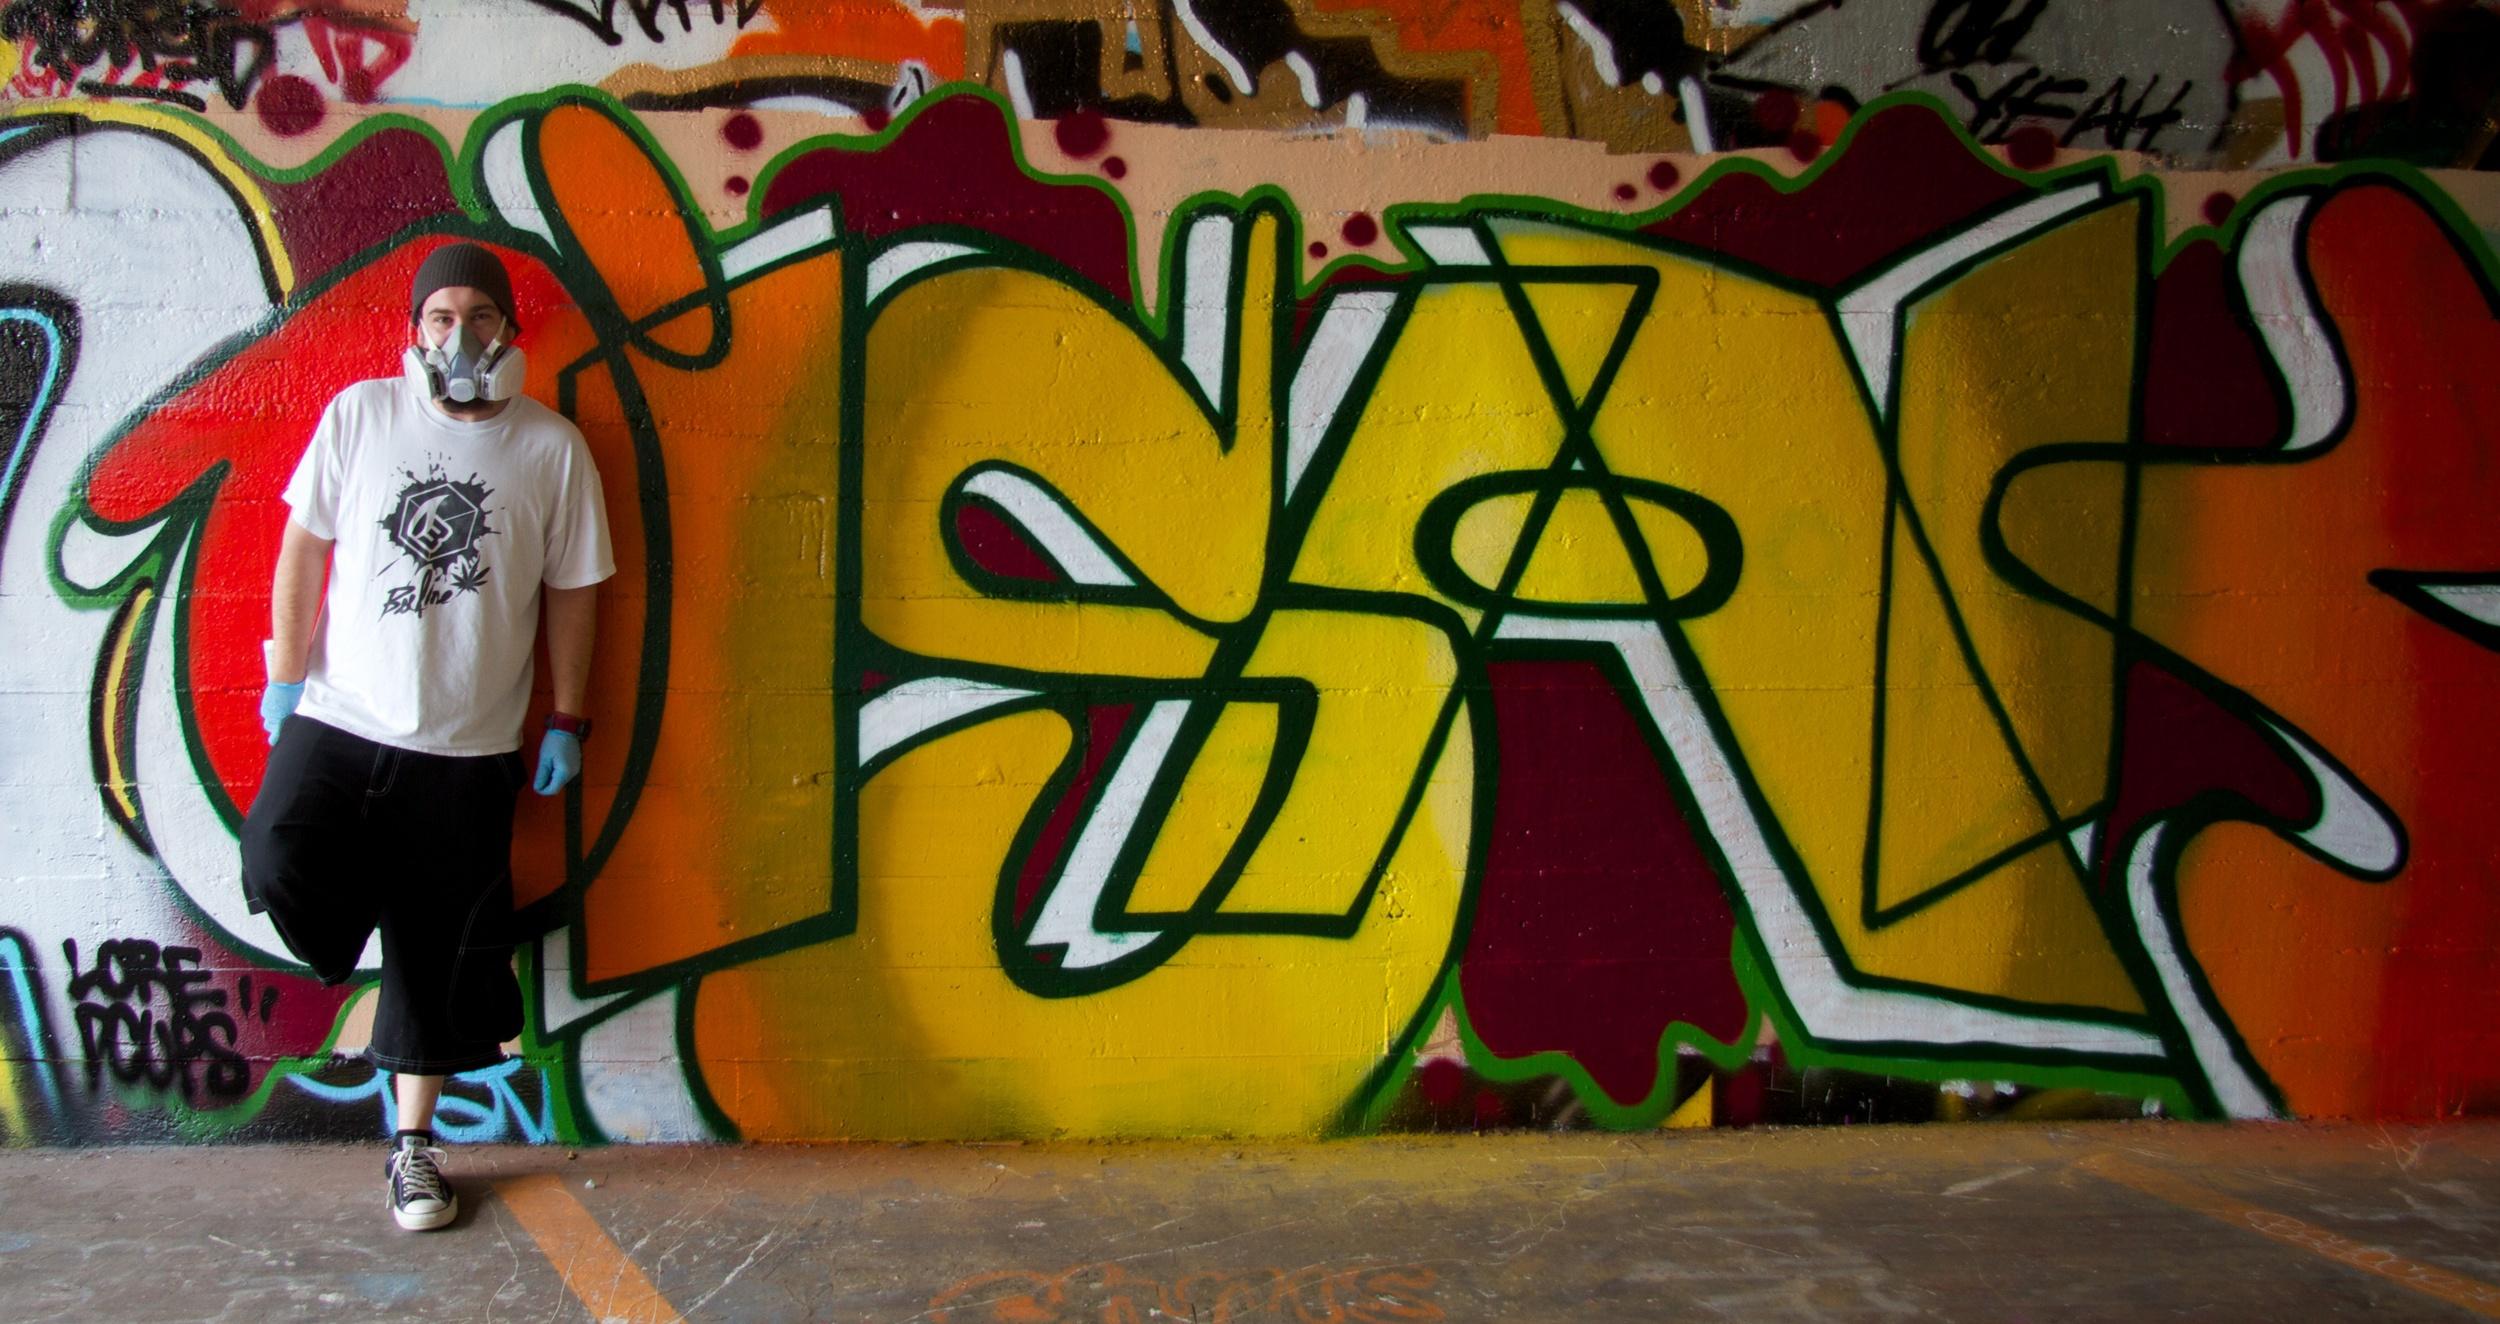 2011-08-14 at 12-05-06 Graffiti, Portrait, Artist, Mask, Vandal, Urban, Street Life, Yellow, Orange.jpg